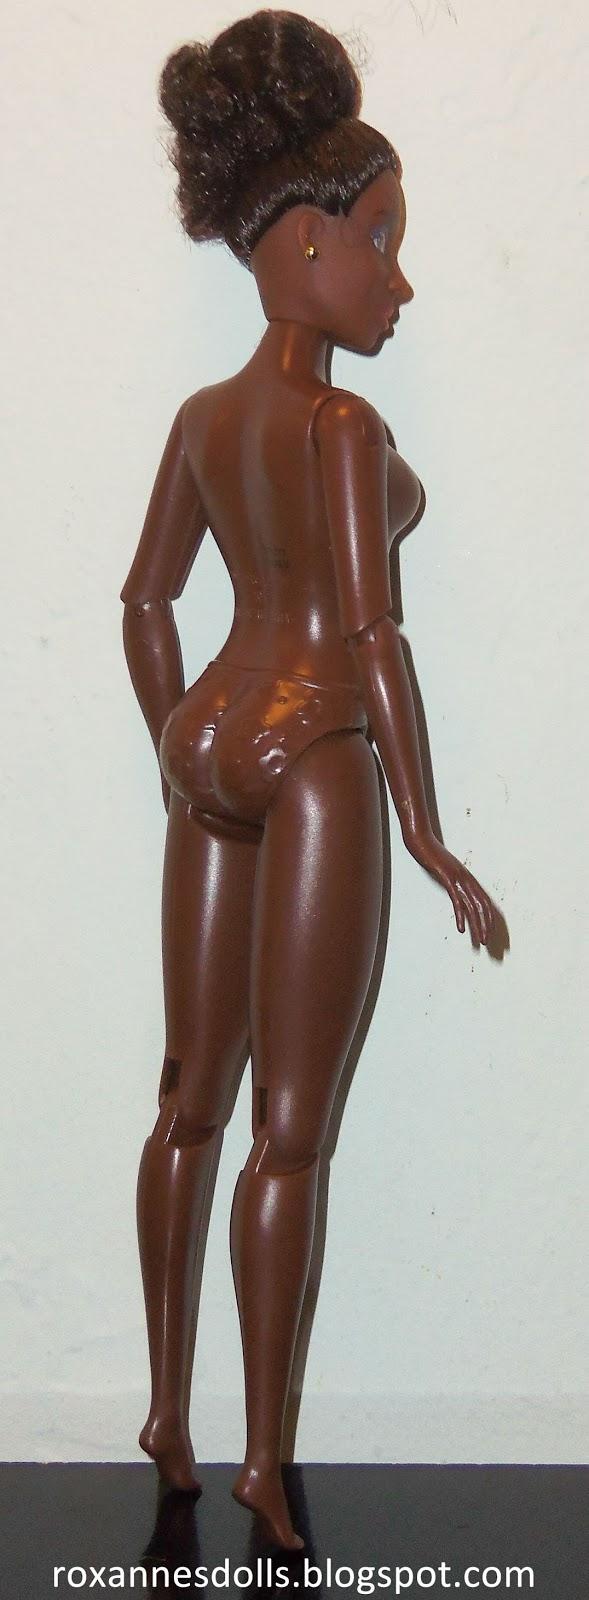 Escort filipina massage sex